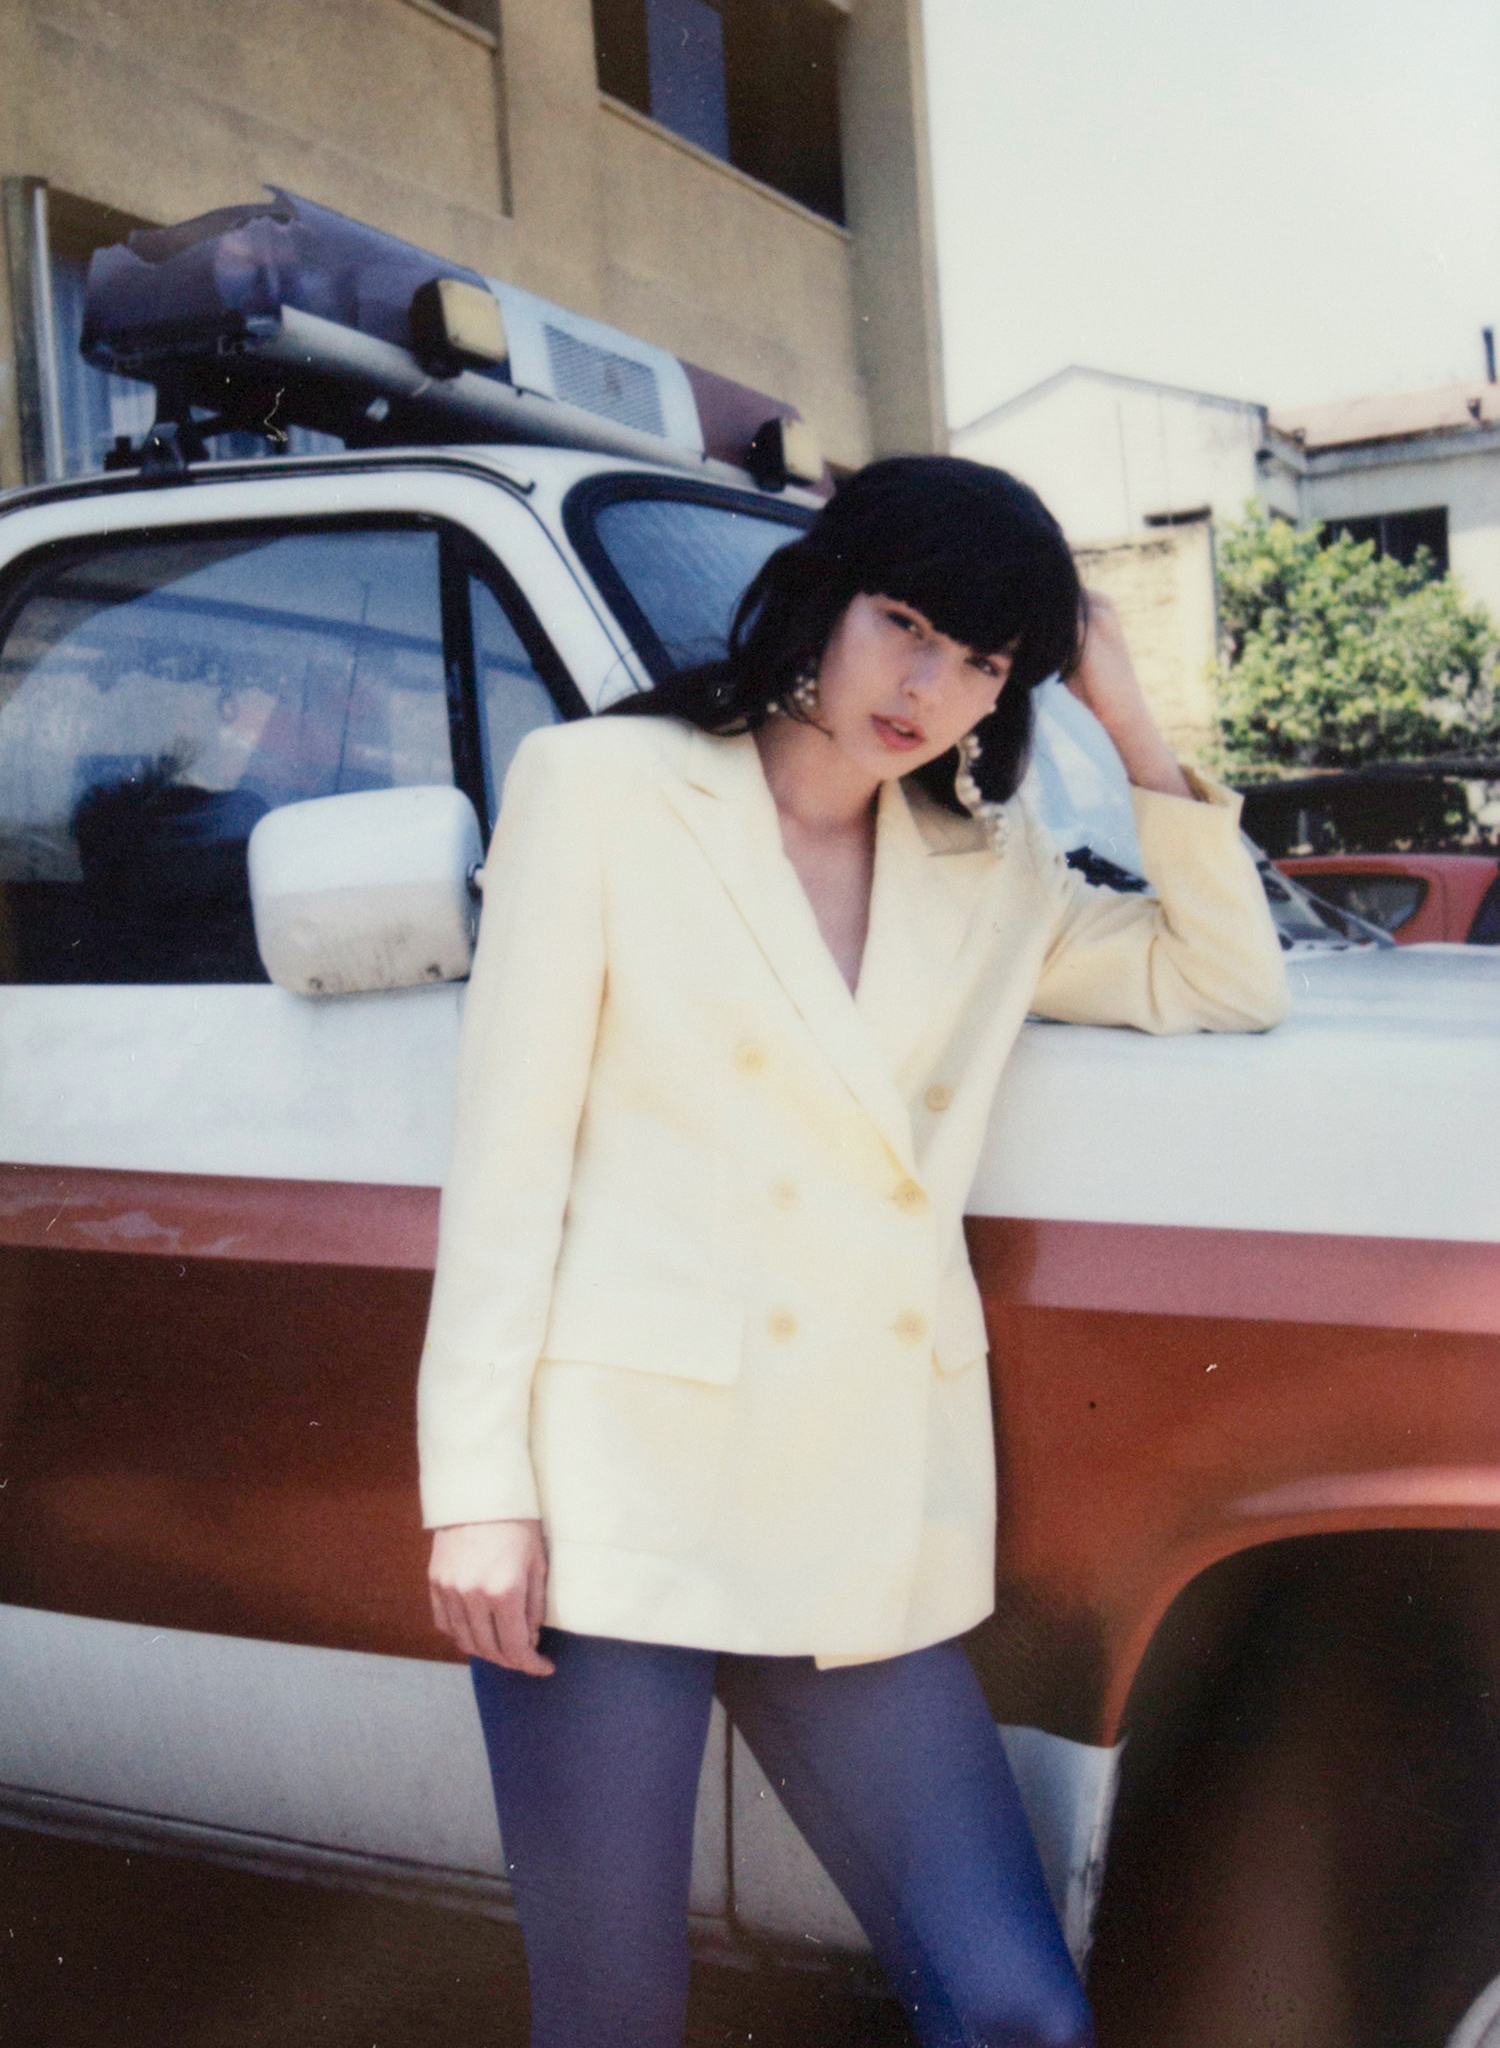 My Garage   Published on 24 January 2019   Photographer  Consuelo Ovalle @consuelovalle  Styling  Felipe González B. @felipegbasoalto  Make up and hair  Macka Nuñez @mackanunez  Model  Kc @kc.kelso at We Love Models